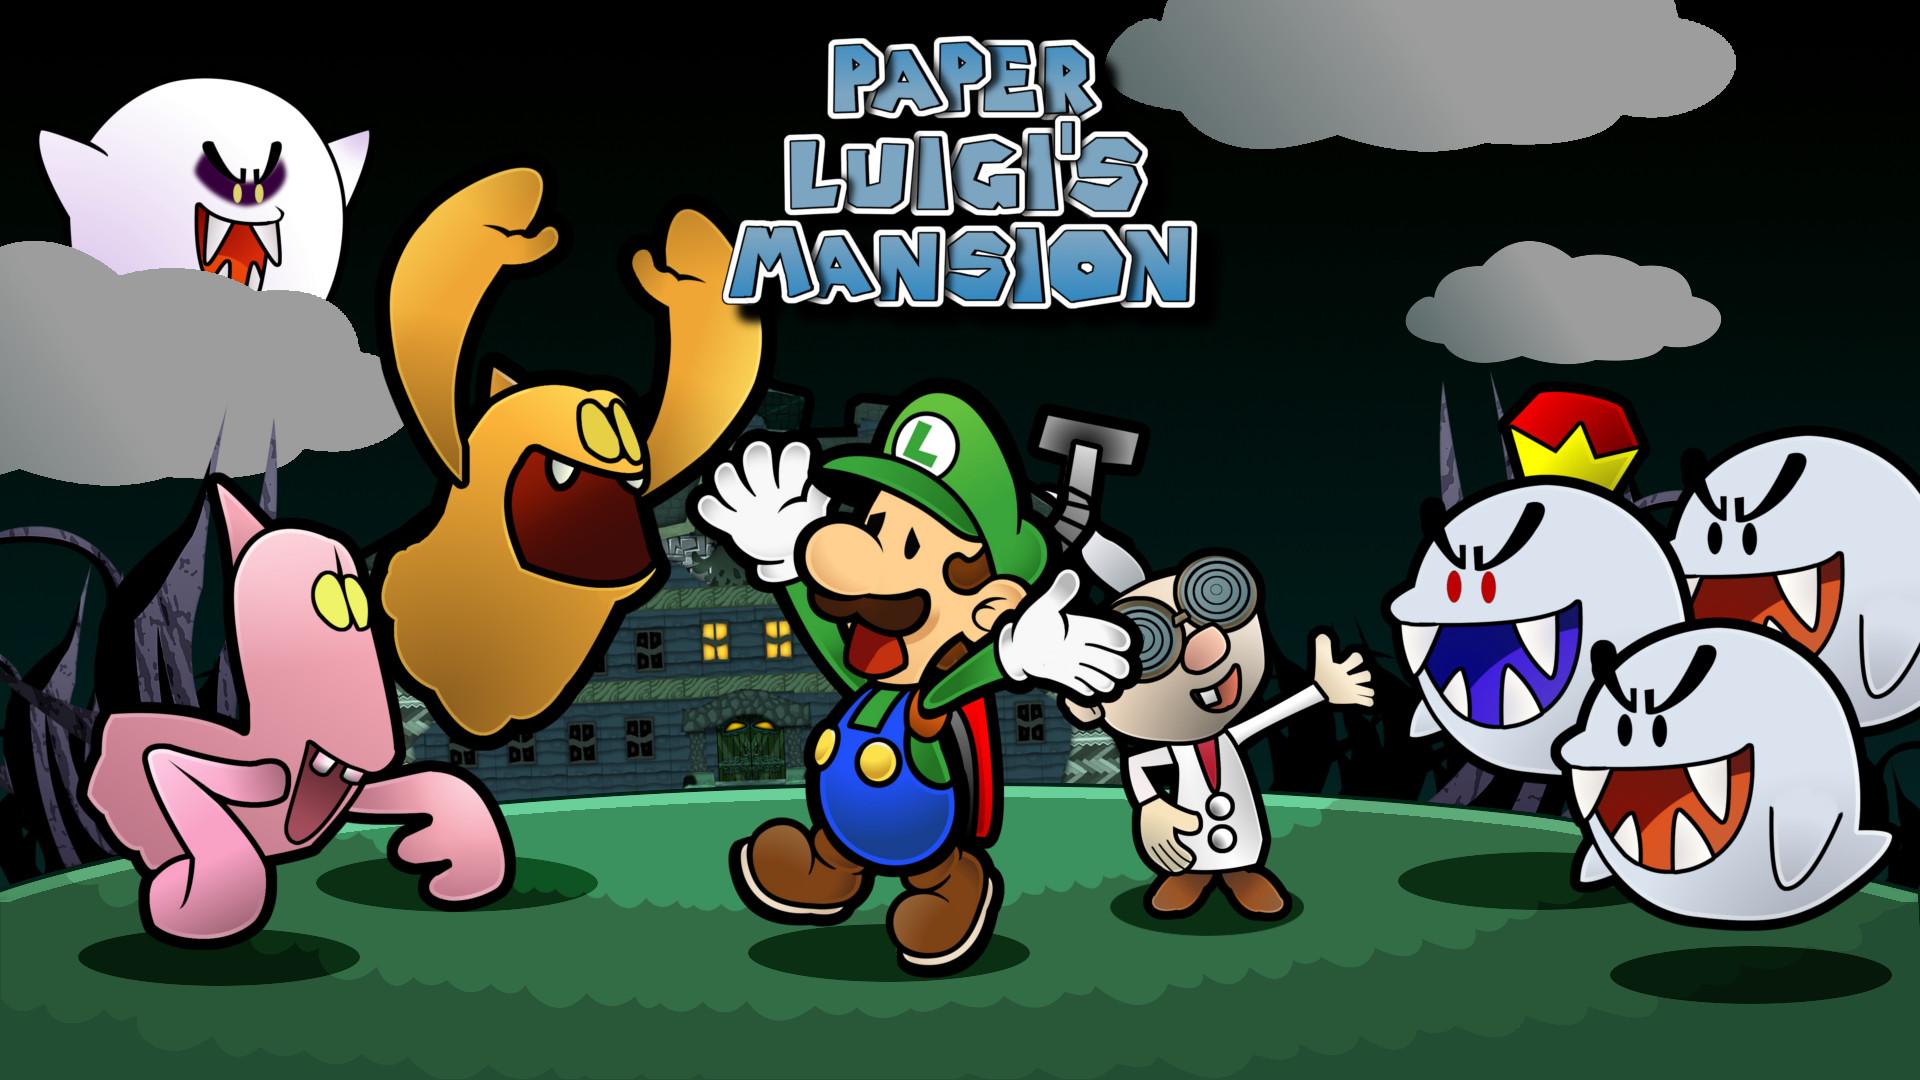 … Paper Luigi's Mansion by GEO-GIMP